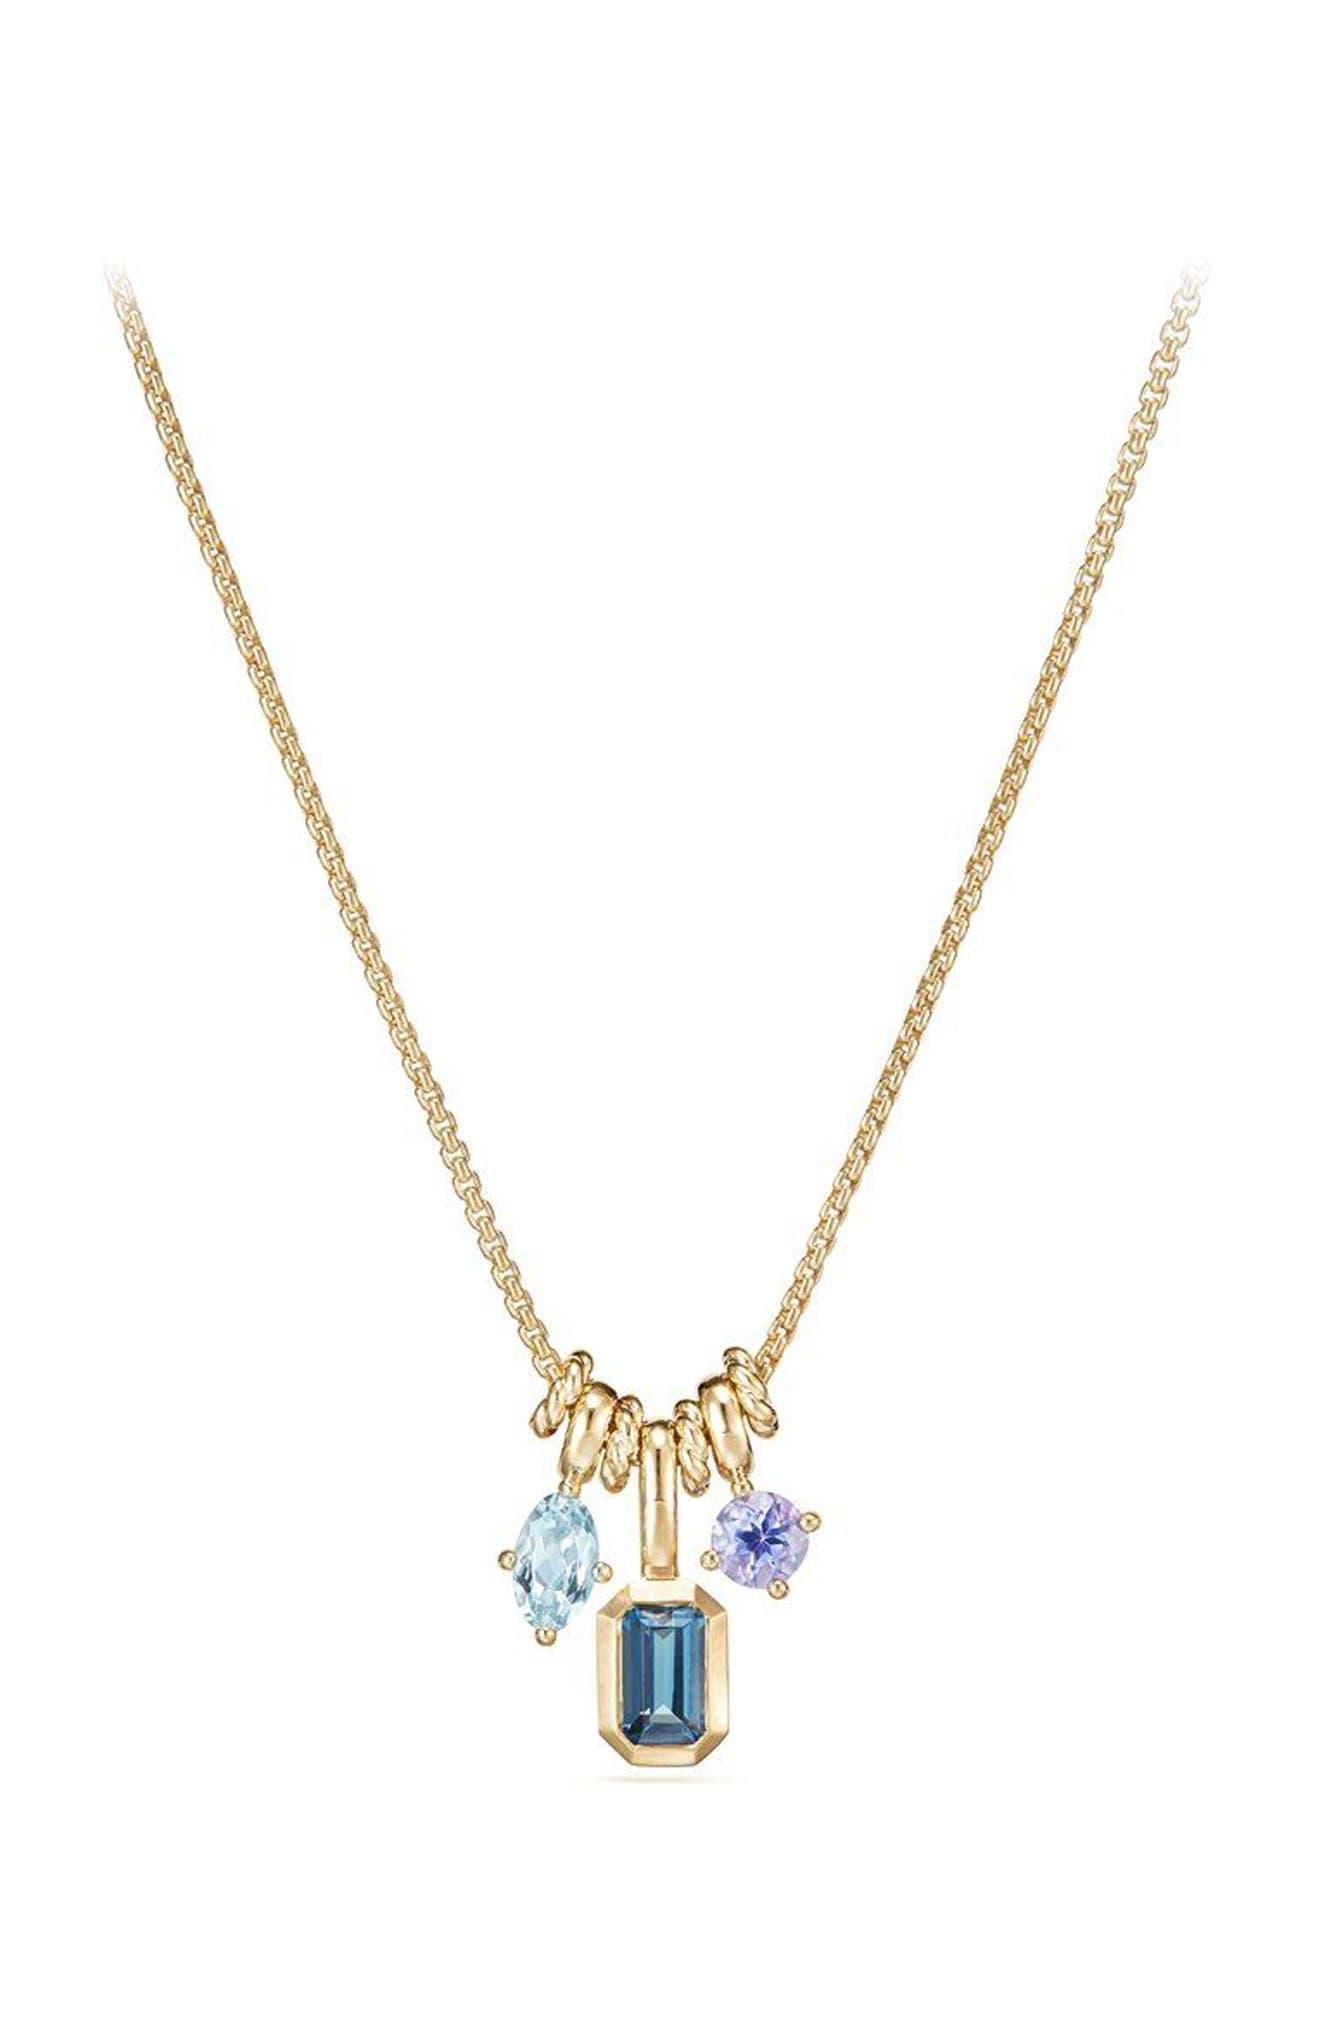 Novella Pendant Necklace in 18K Gold,                             Main thumbnail 1, color,                             GOLD/ BLUE TOPAZ/ AQUAMARINE